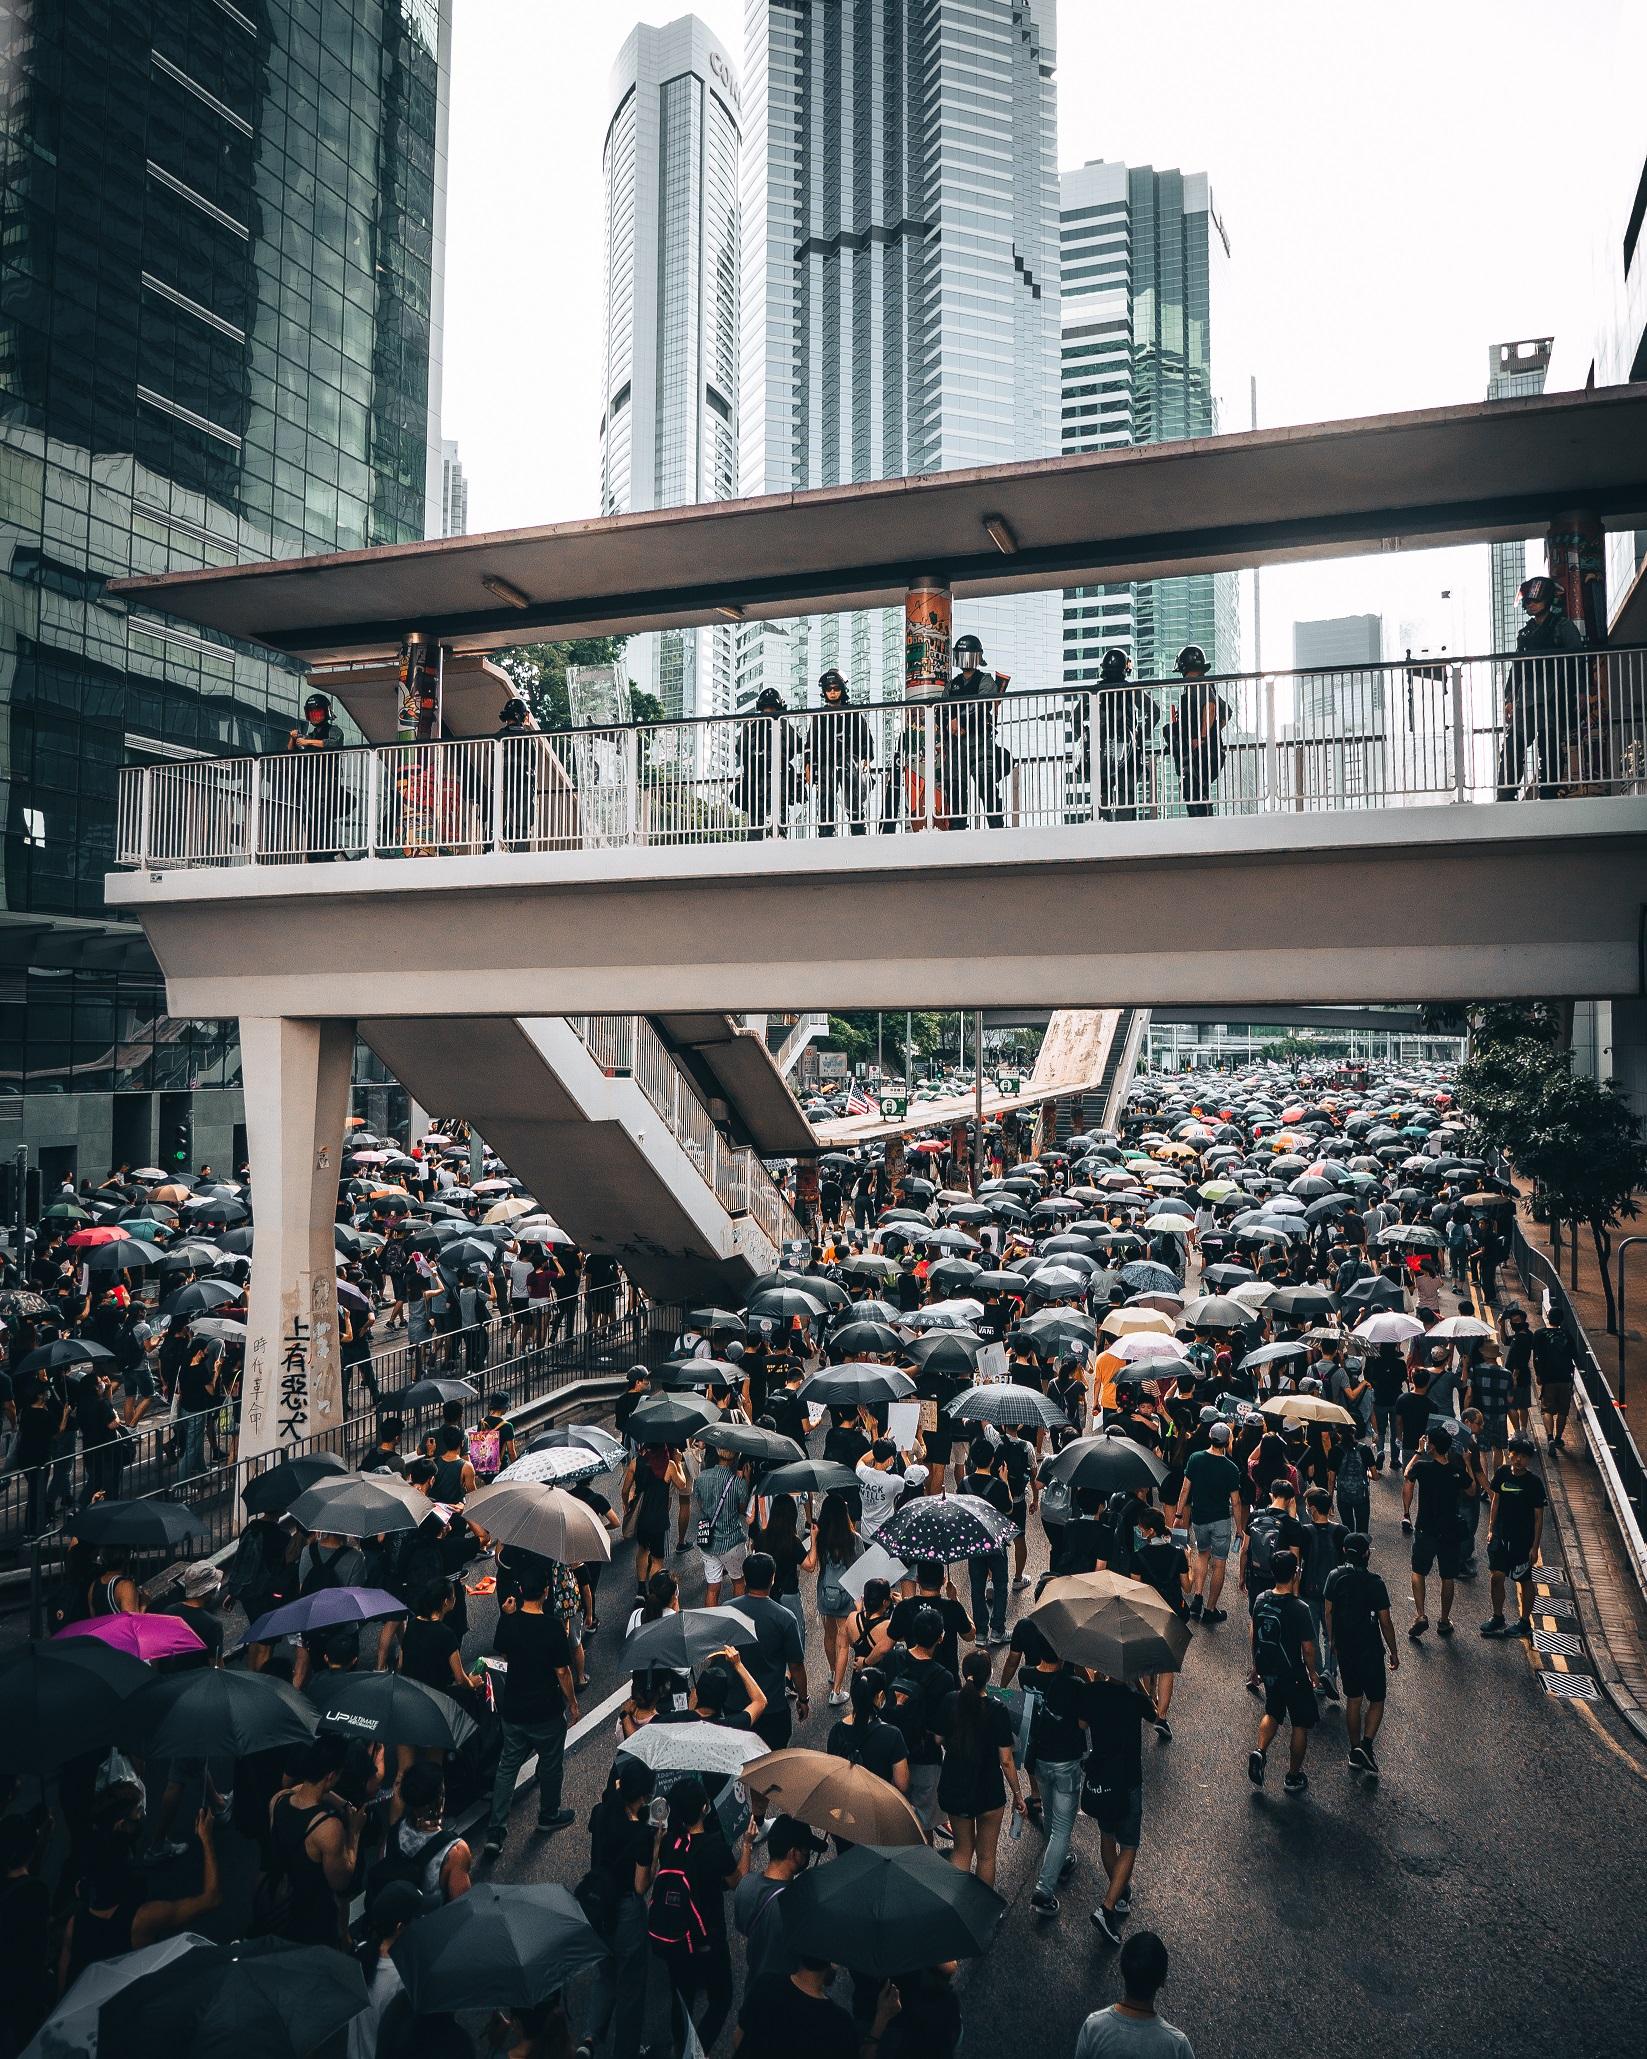 Hong Kong Police Force overlooking protesters in Hong Kong